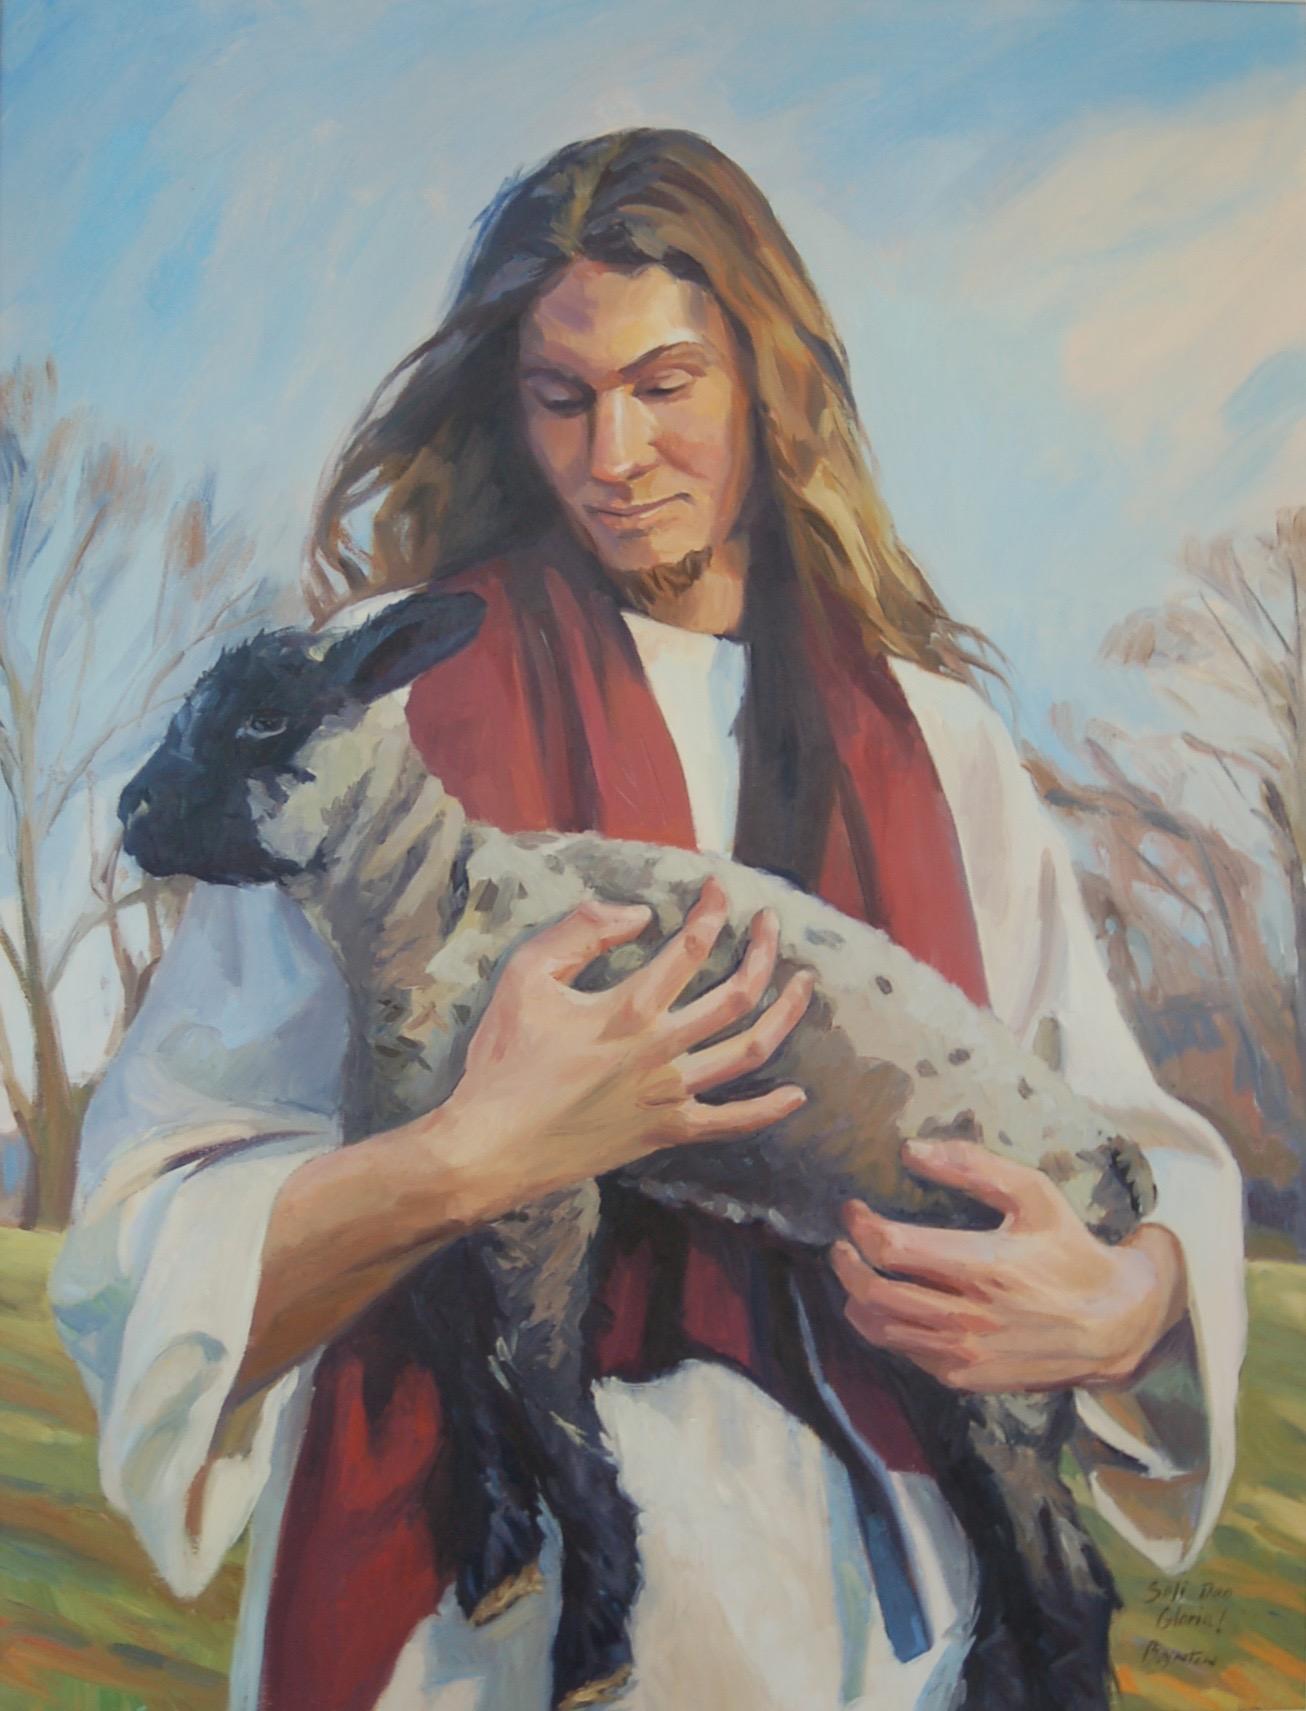 The Good Shepherd, oil painting by Lee Boynton